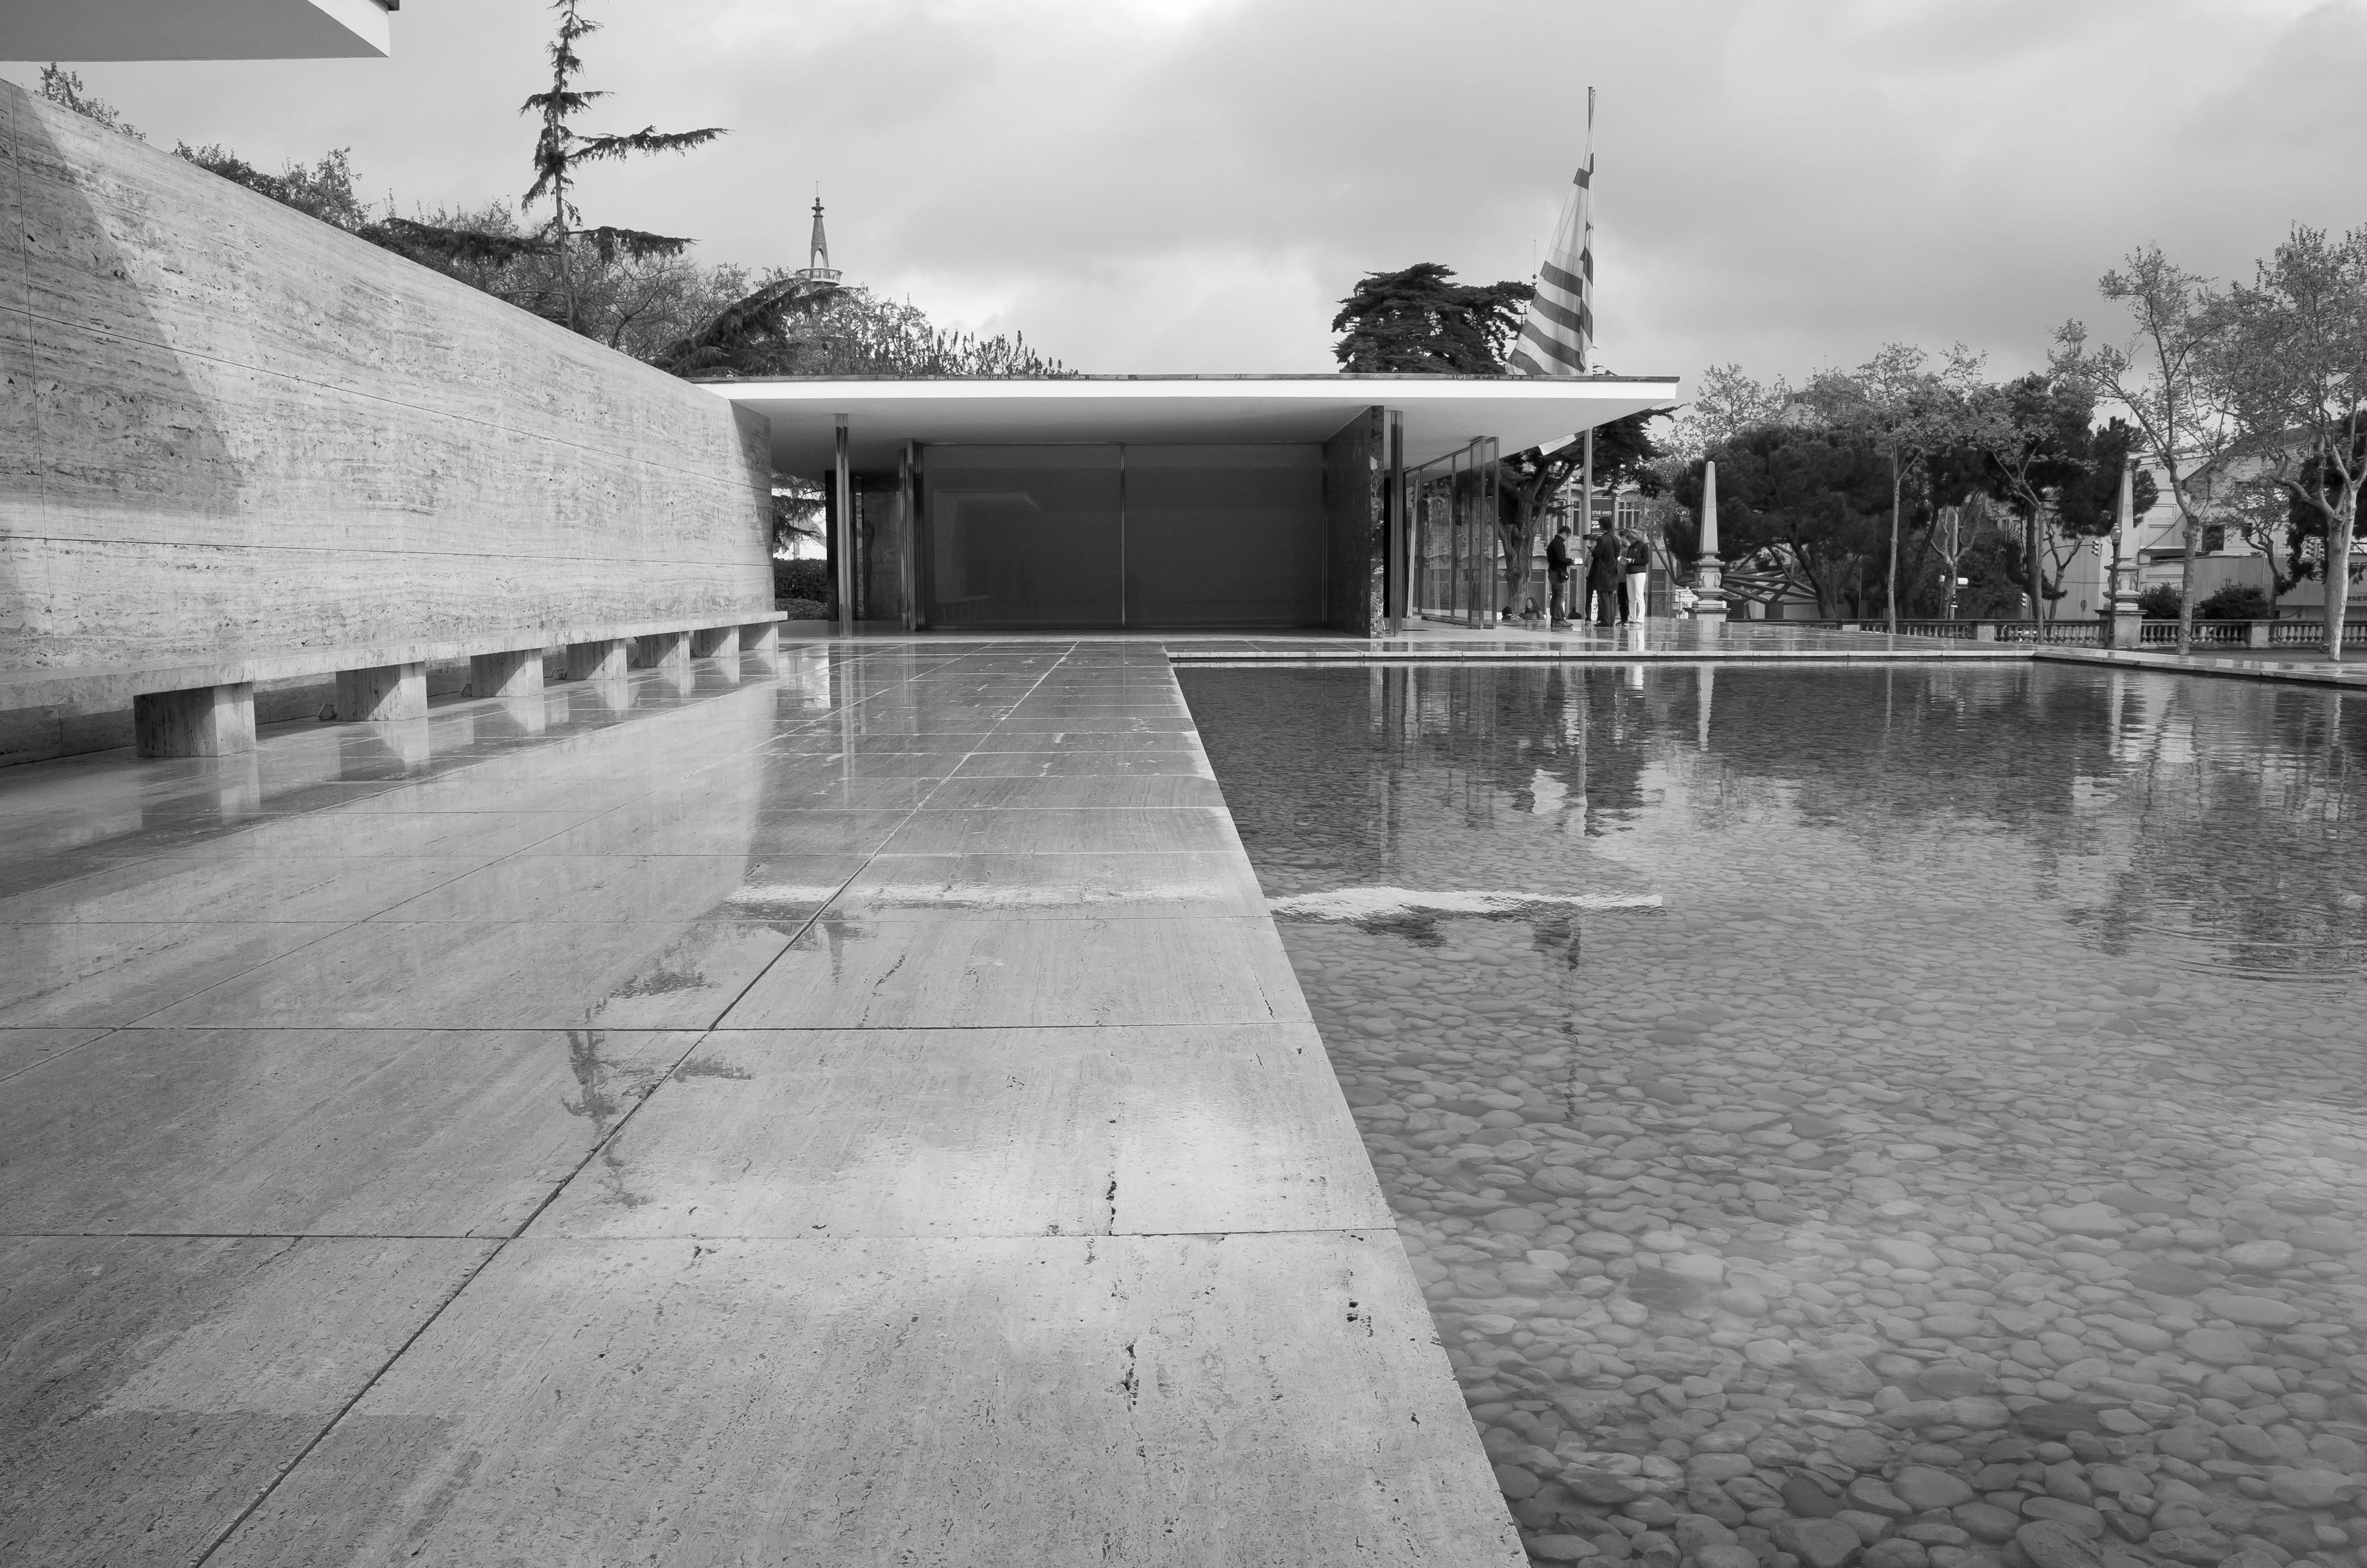 Pavillon Mies van der Rohe, Barcelona, Spain